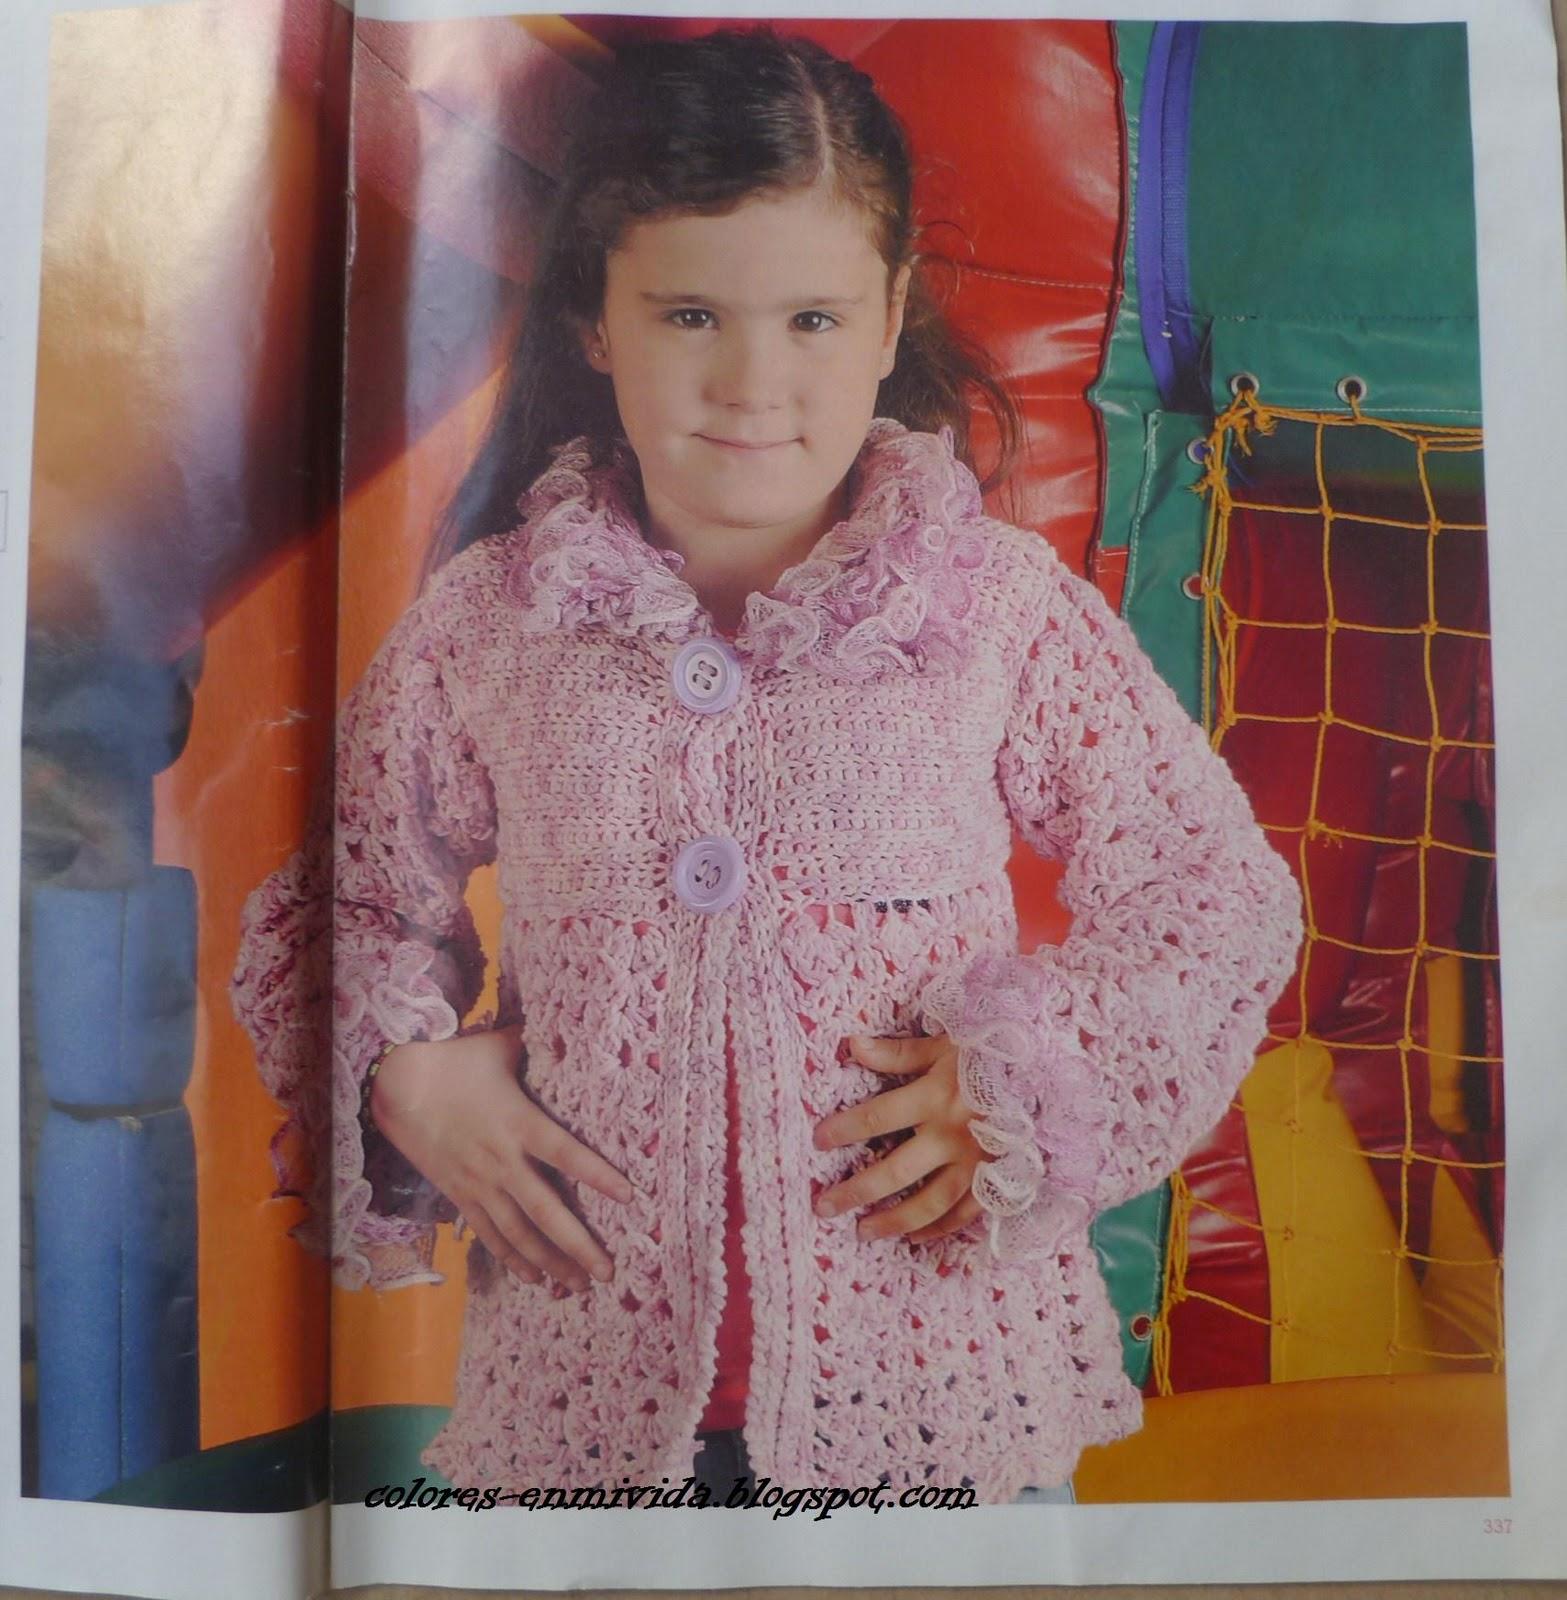 COLORES EN MI VIDA  Color de verano para un saco de niña c2e09bf3a36f